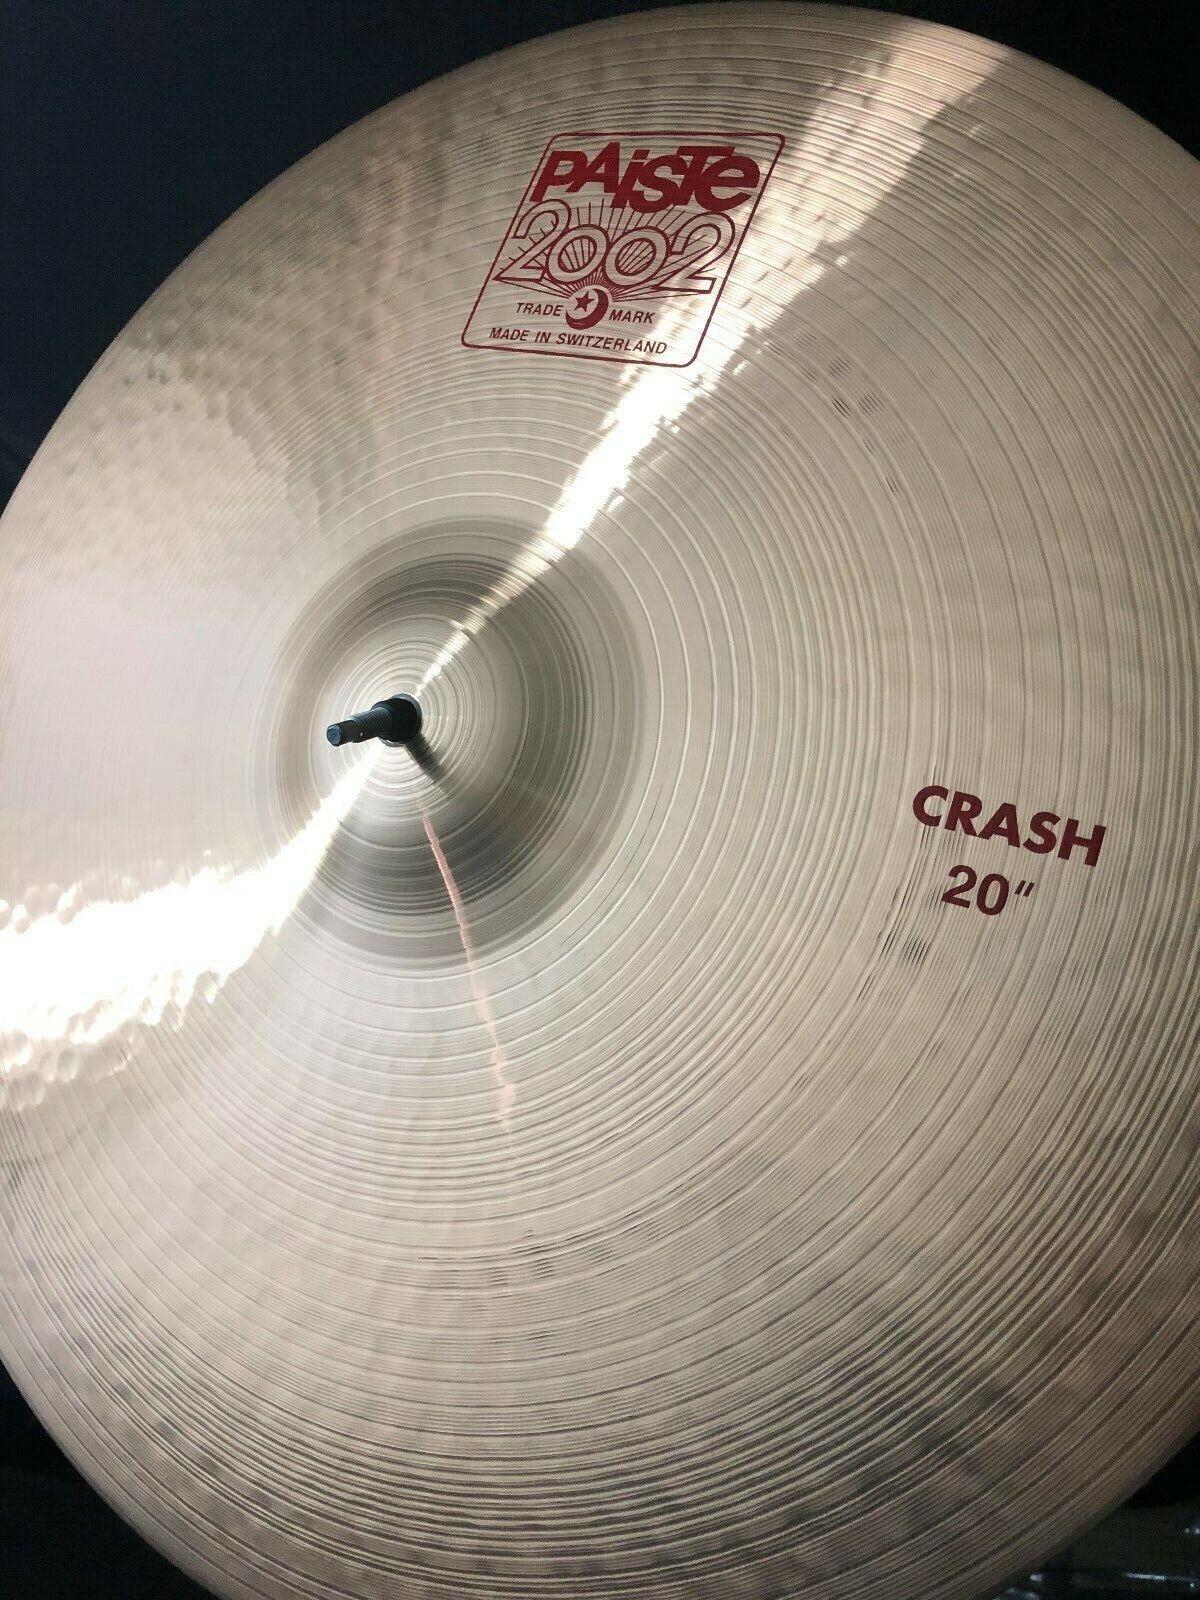 Paiste 20  2002 Crash Cymbal